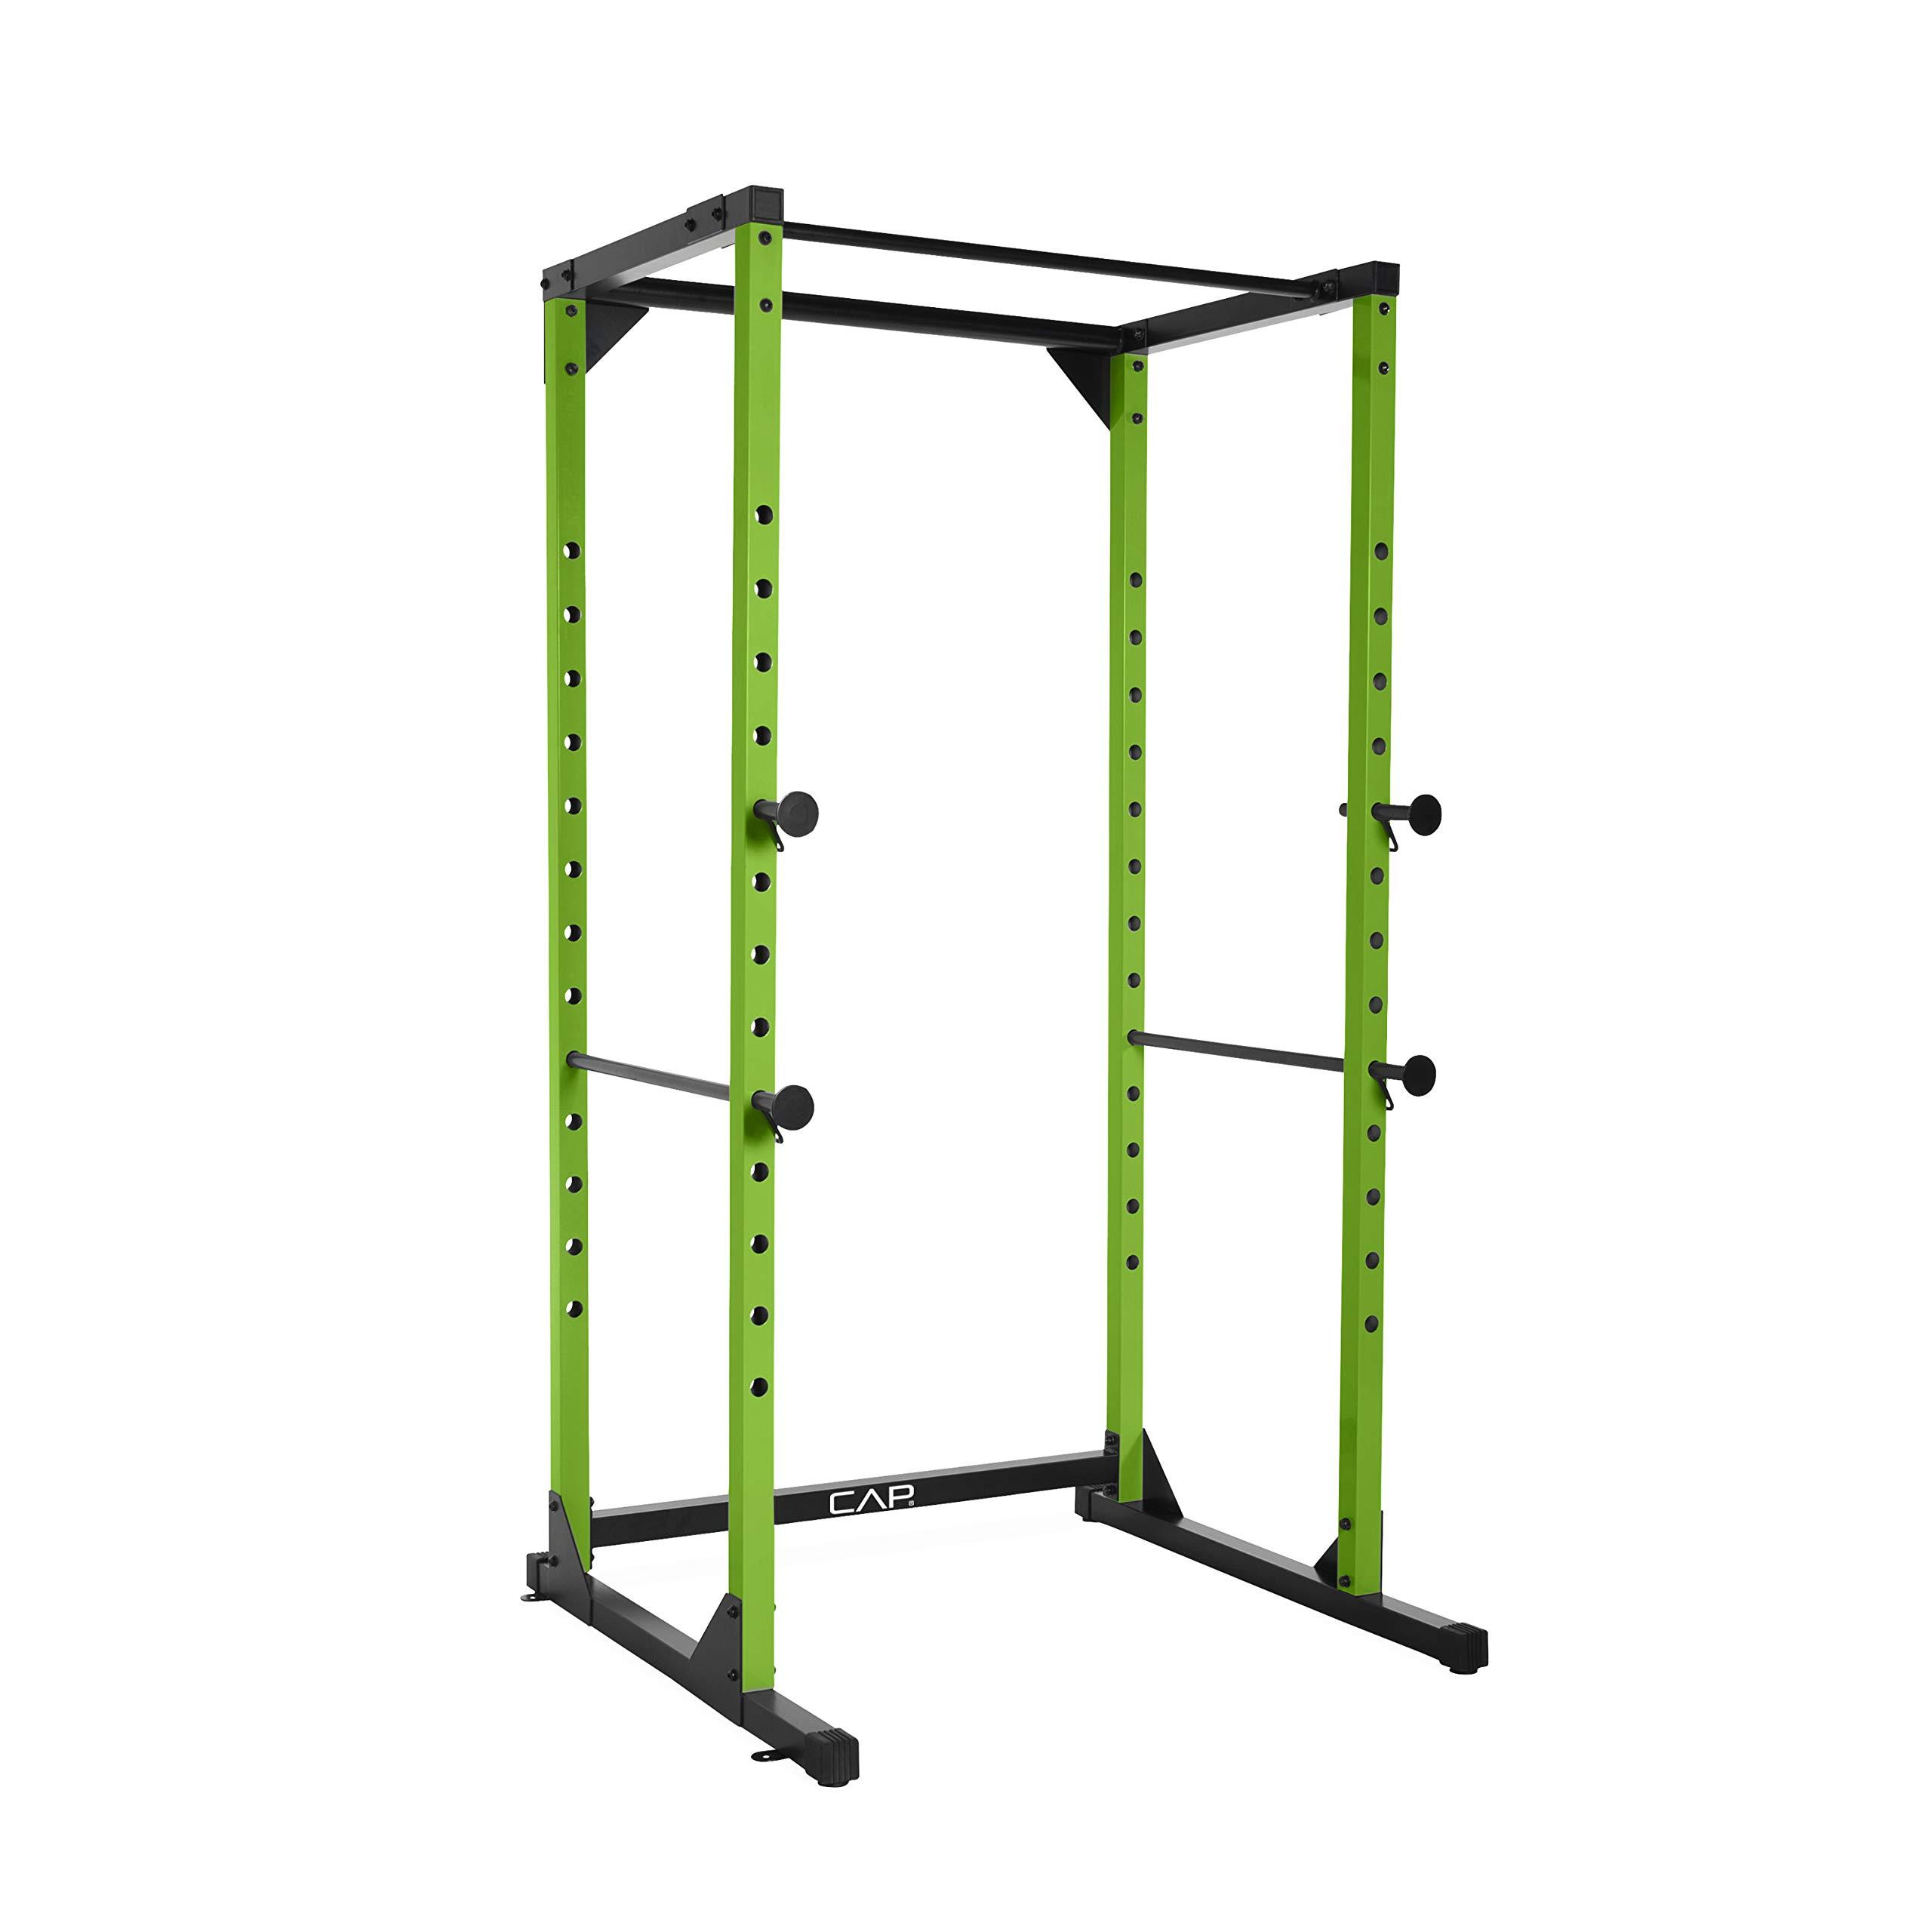 CAP Barbell Full Cage Power Rack, 7-Foot, Green